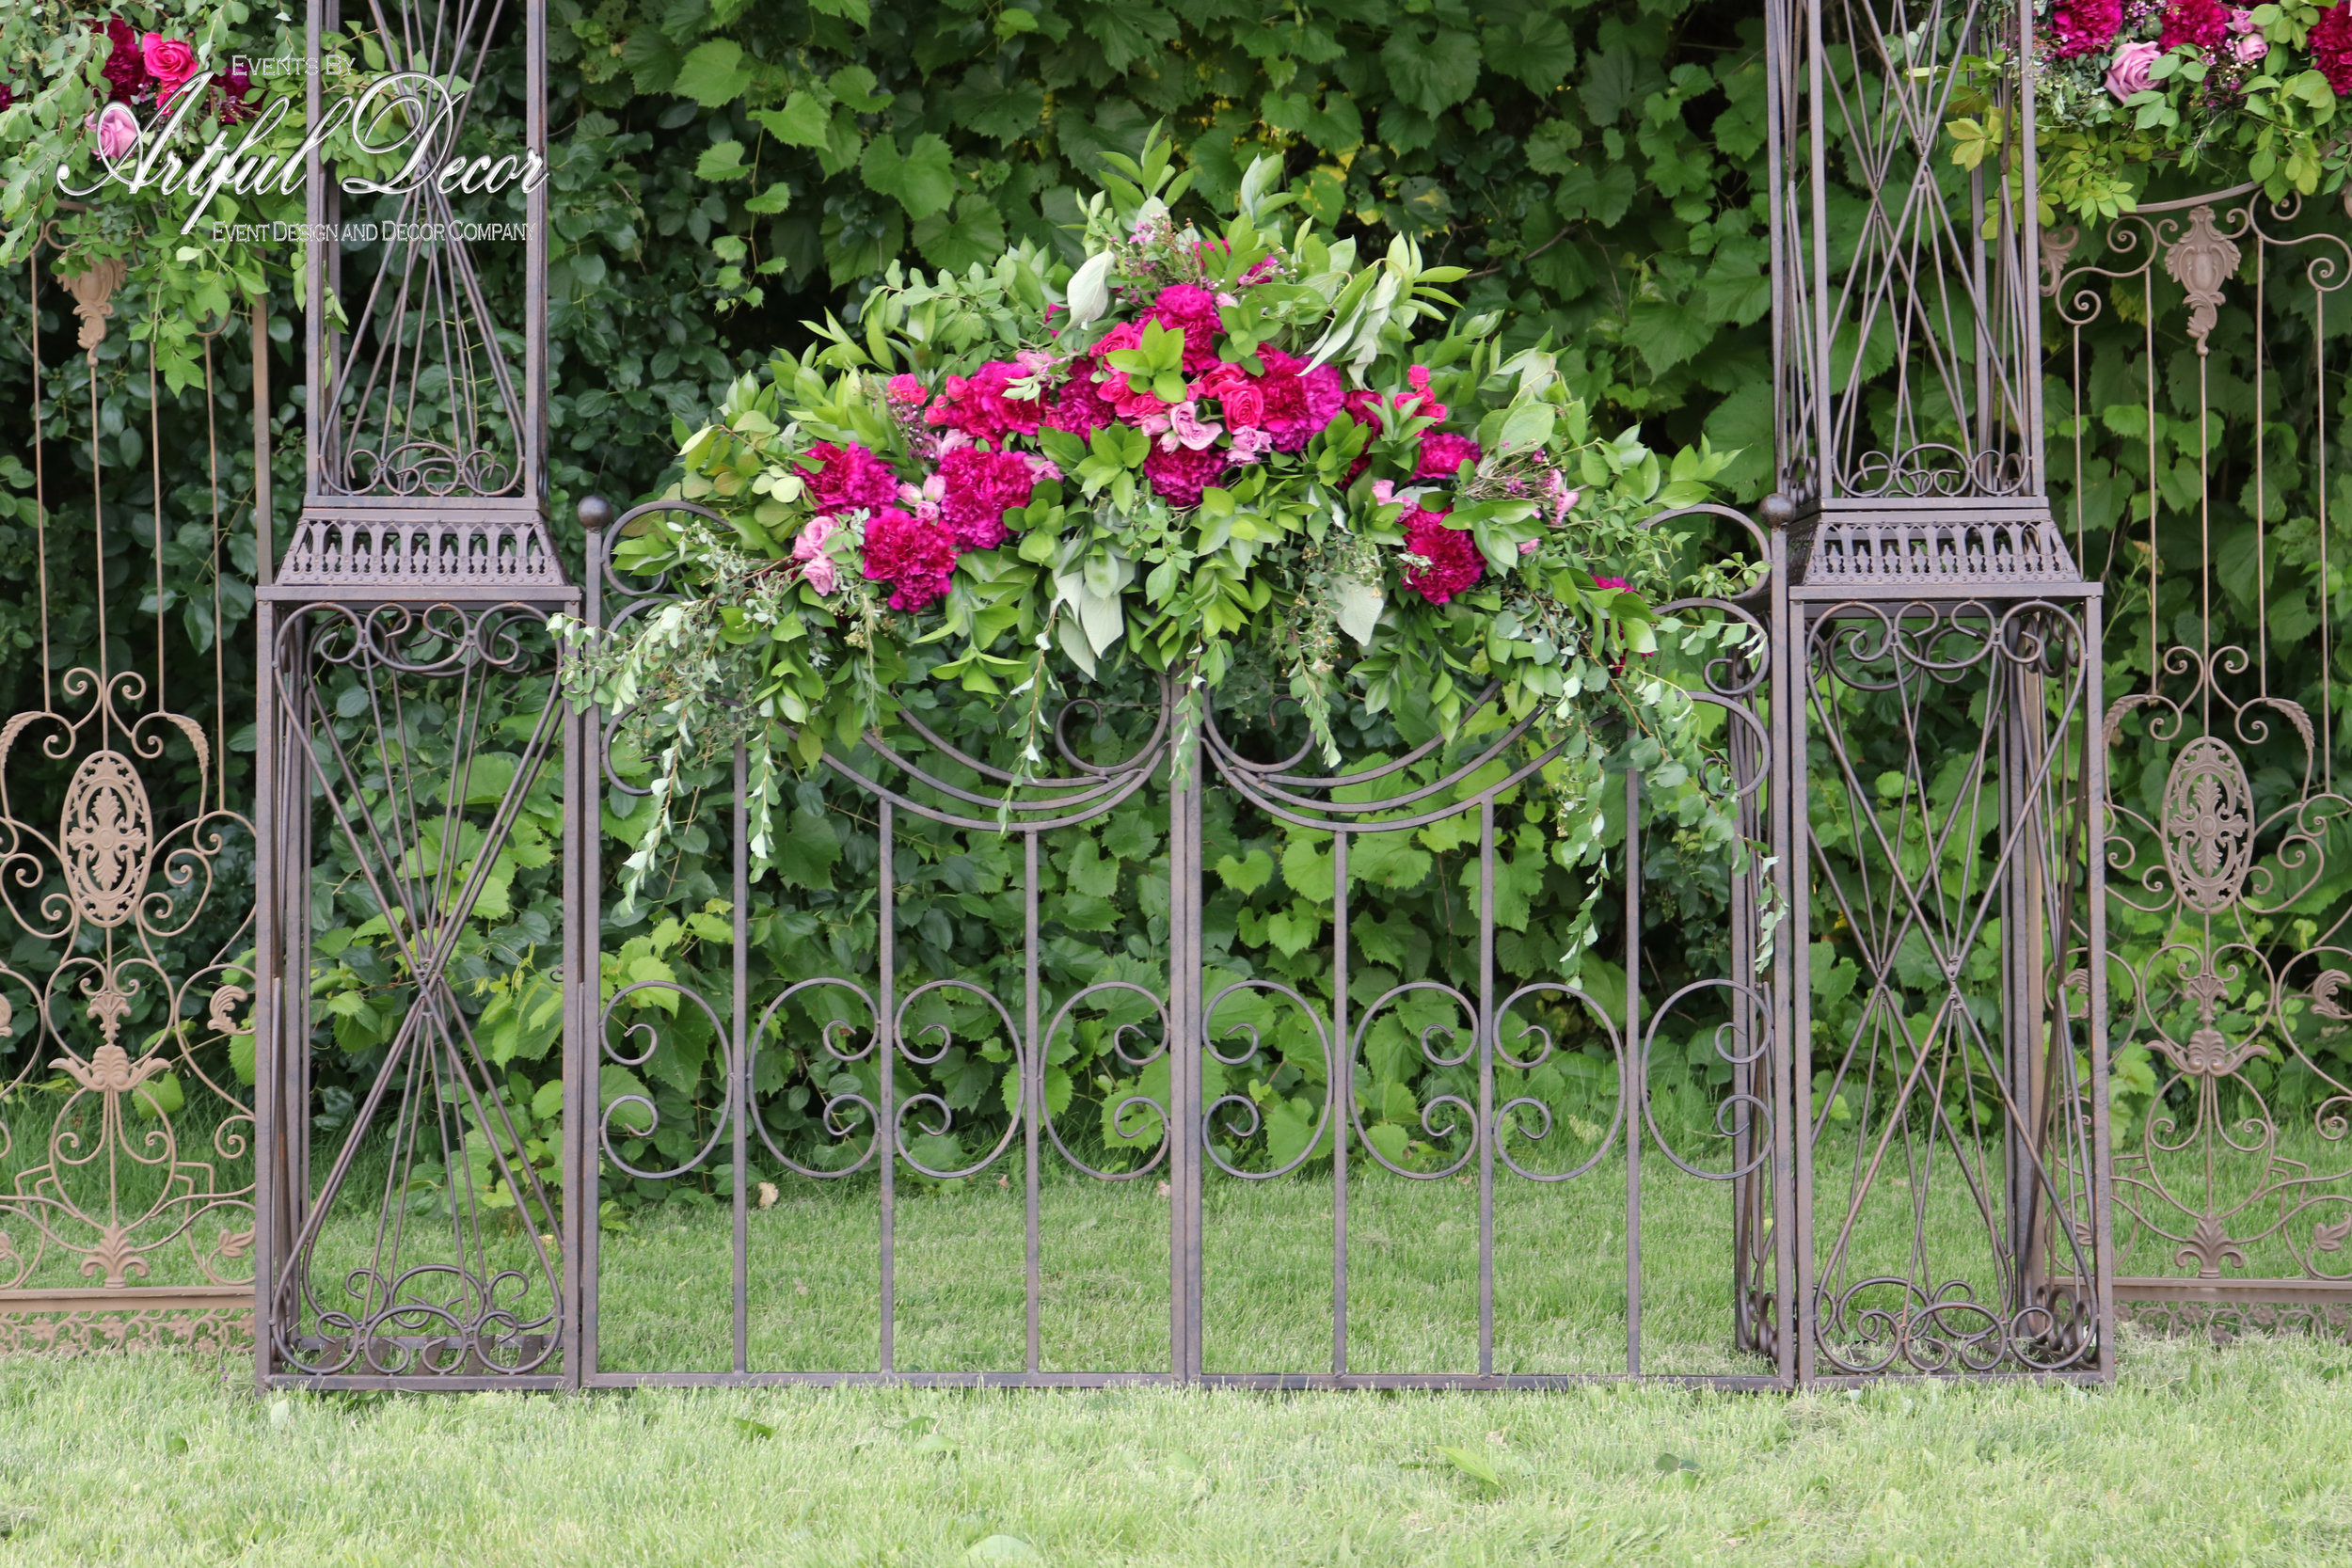 Garden Gate 21 Copyright.jpg